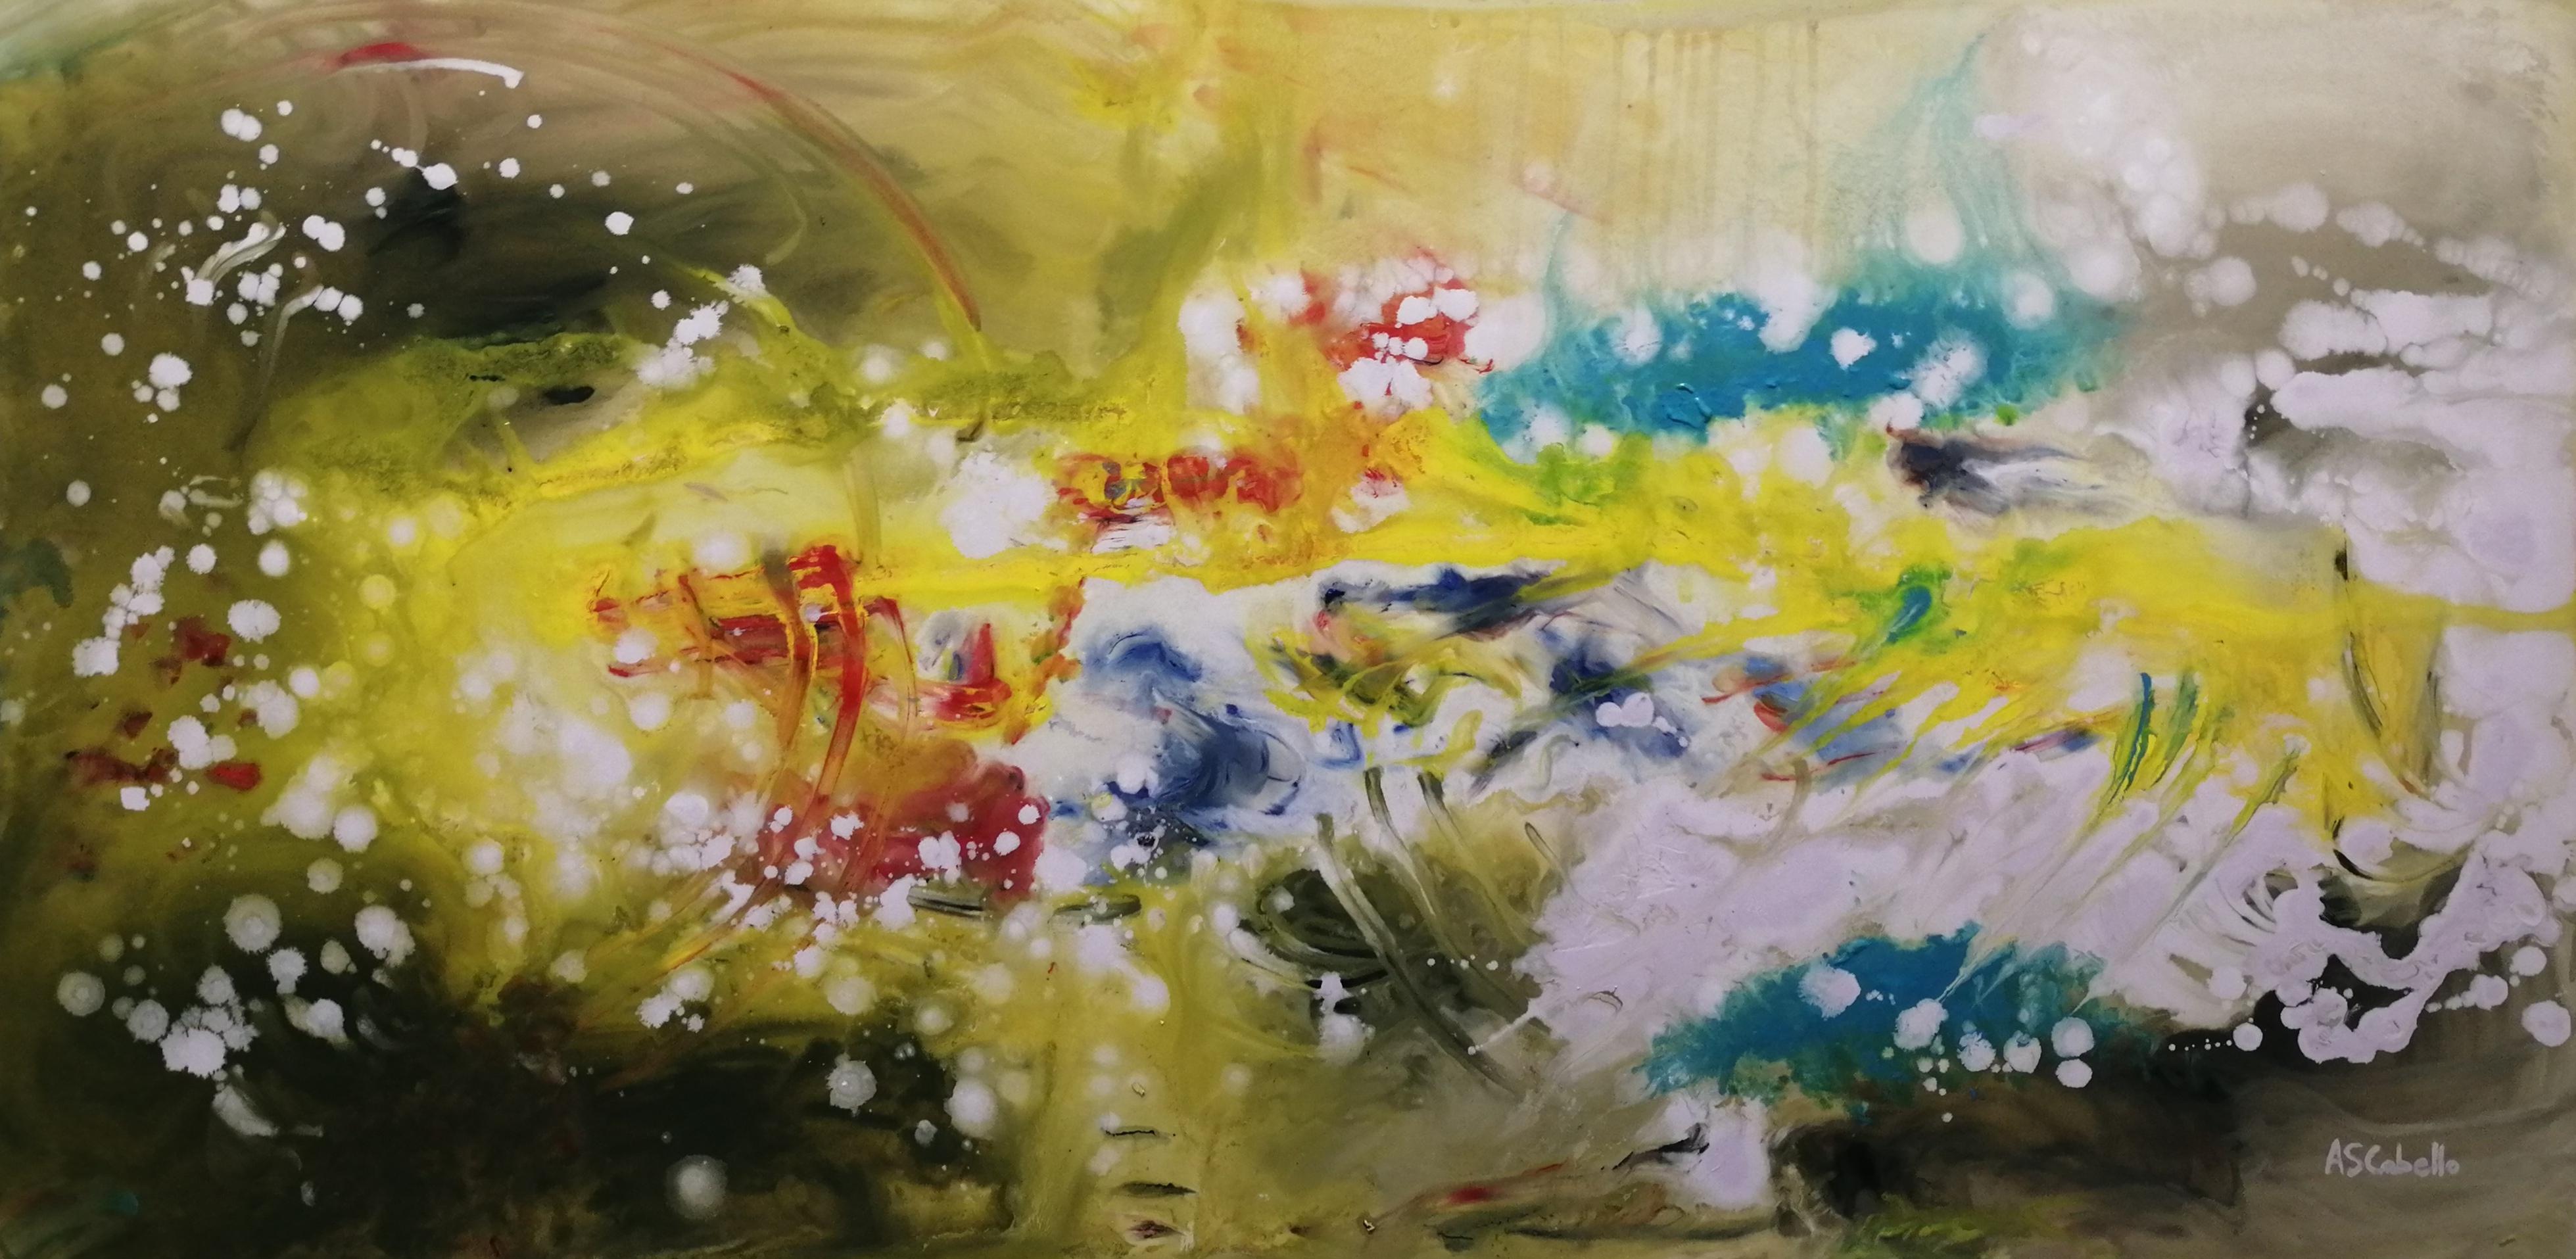 Between abstract clarity